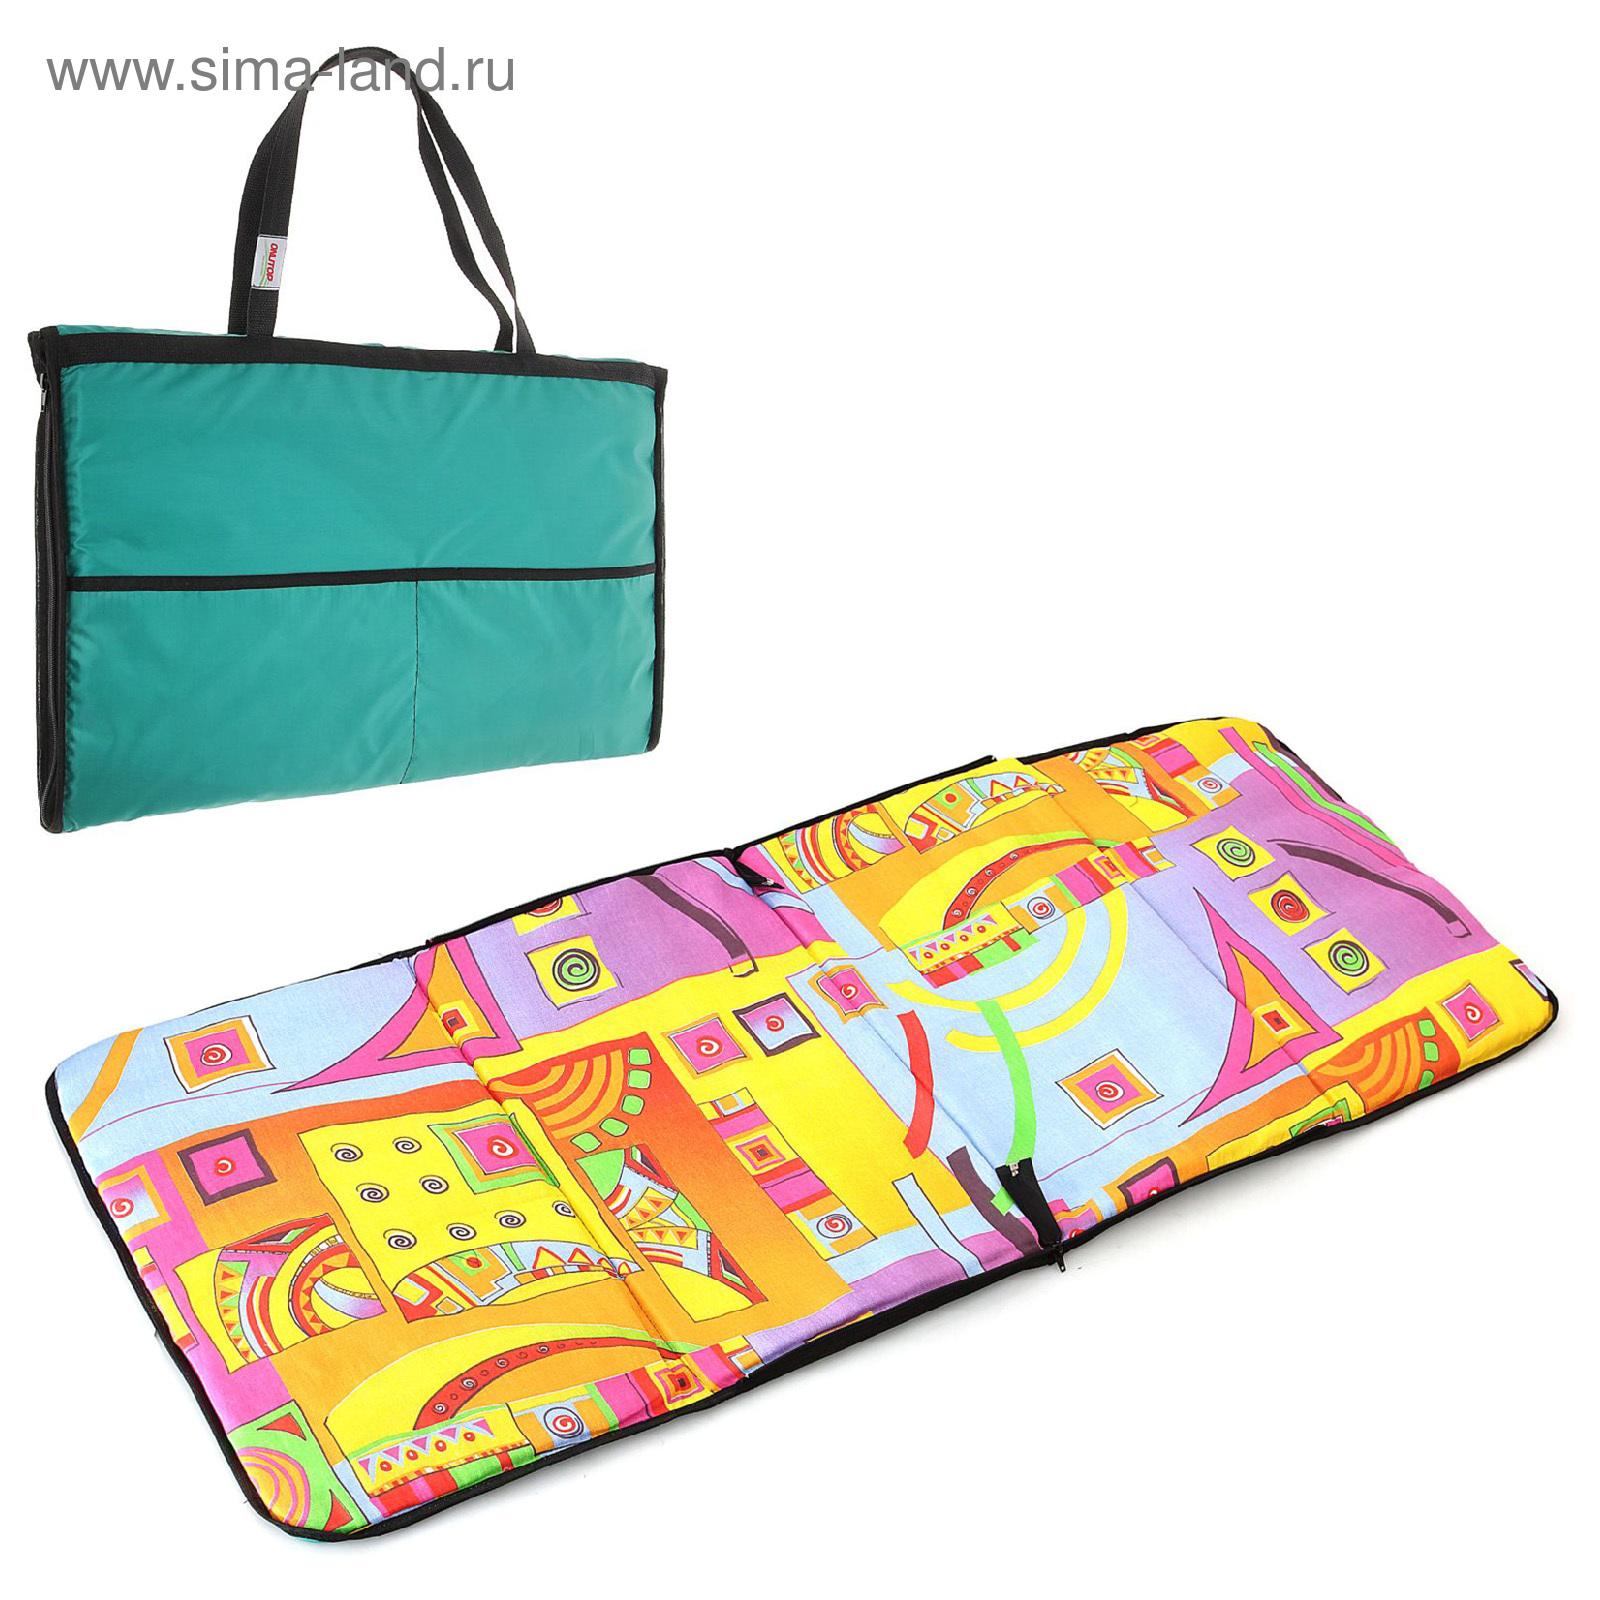 Коврик-сумка для фитнеса, пляжа, йоги, размер 135 х 53 см, цвета ... 556f8e82e96